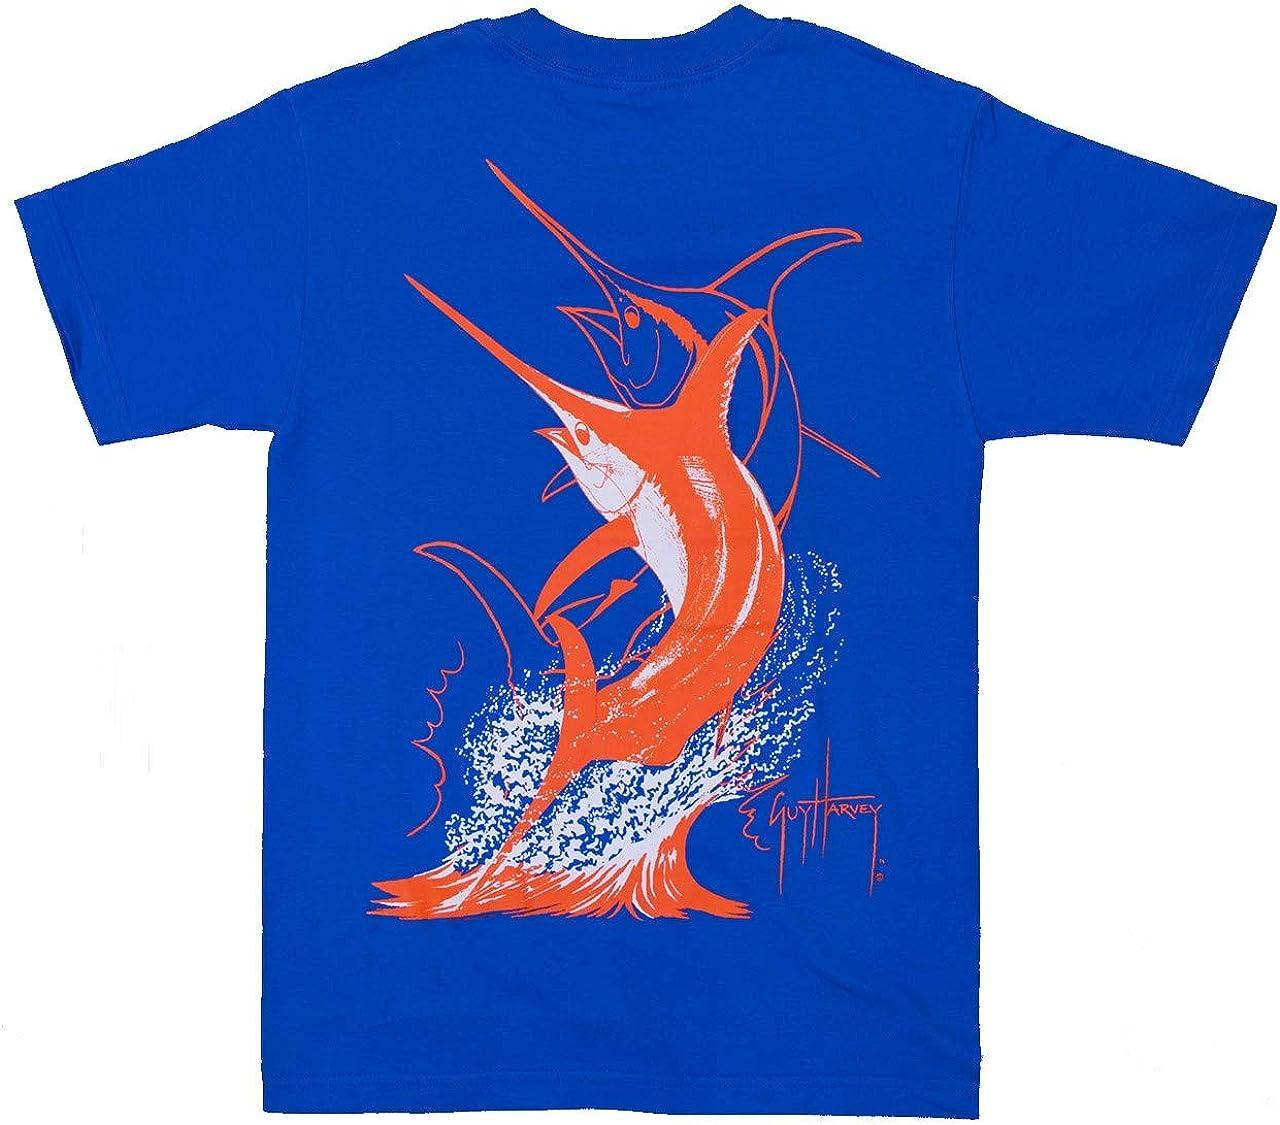 Guy Harvey Swordfish Strike Back-Print Pocket-Free Tee, Orange and White Printing on a Royal Blue Shirt - Medium…